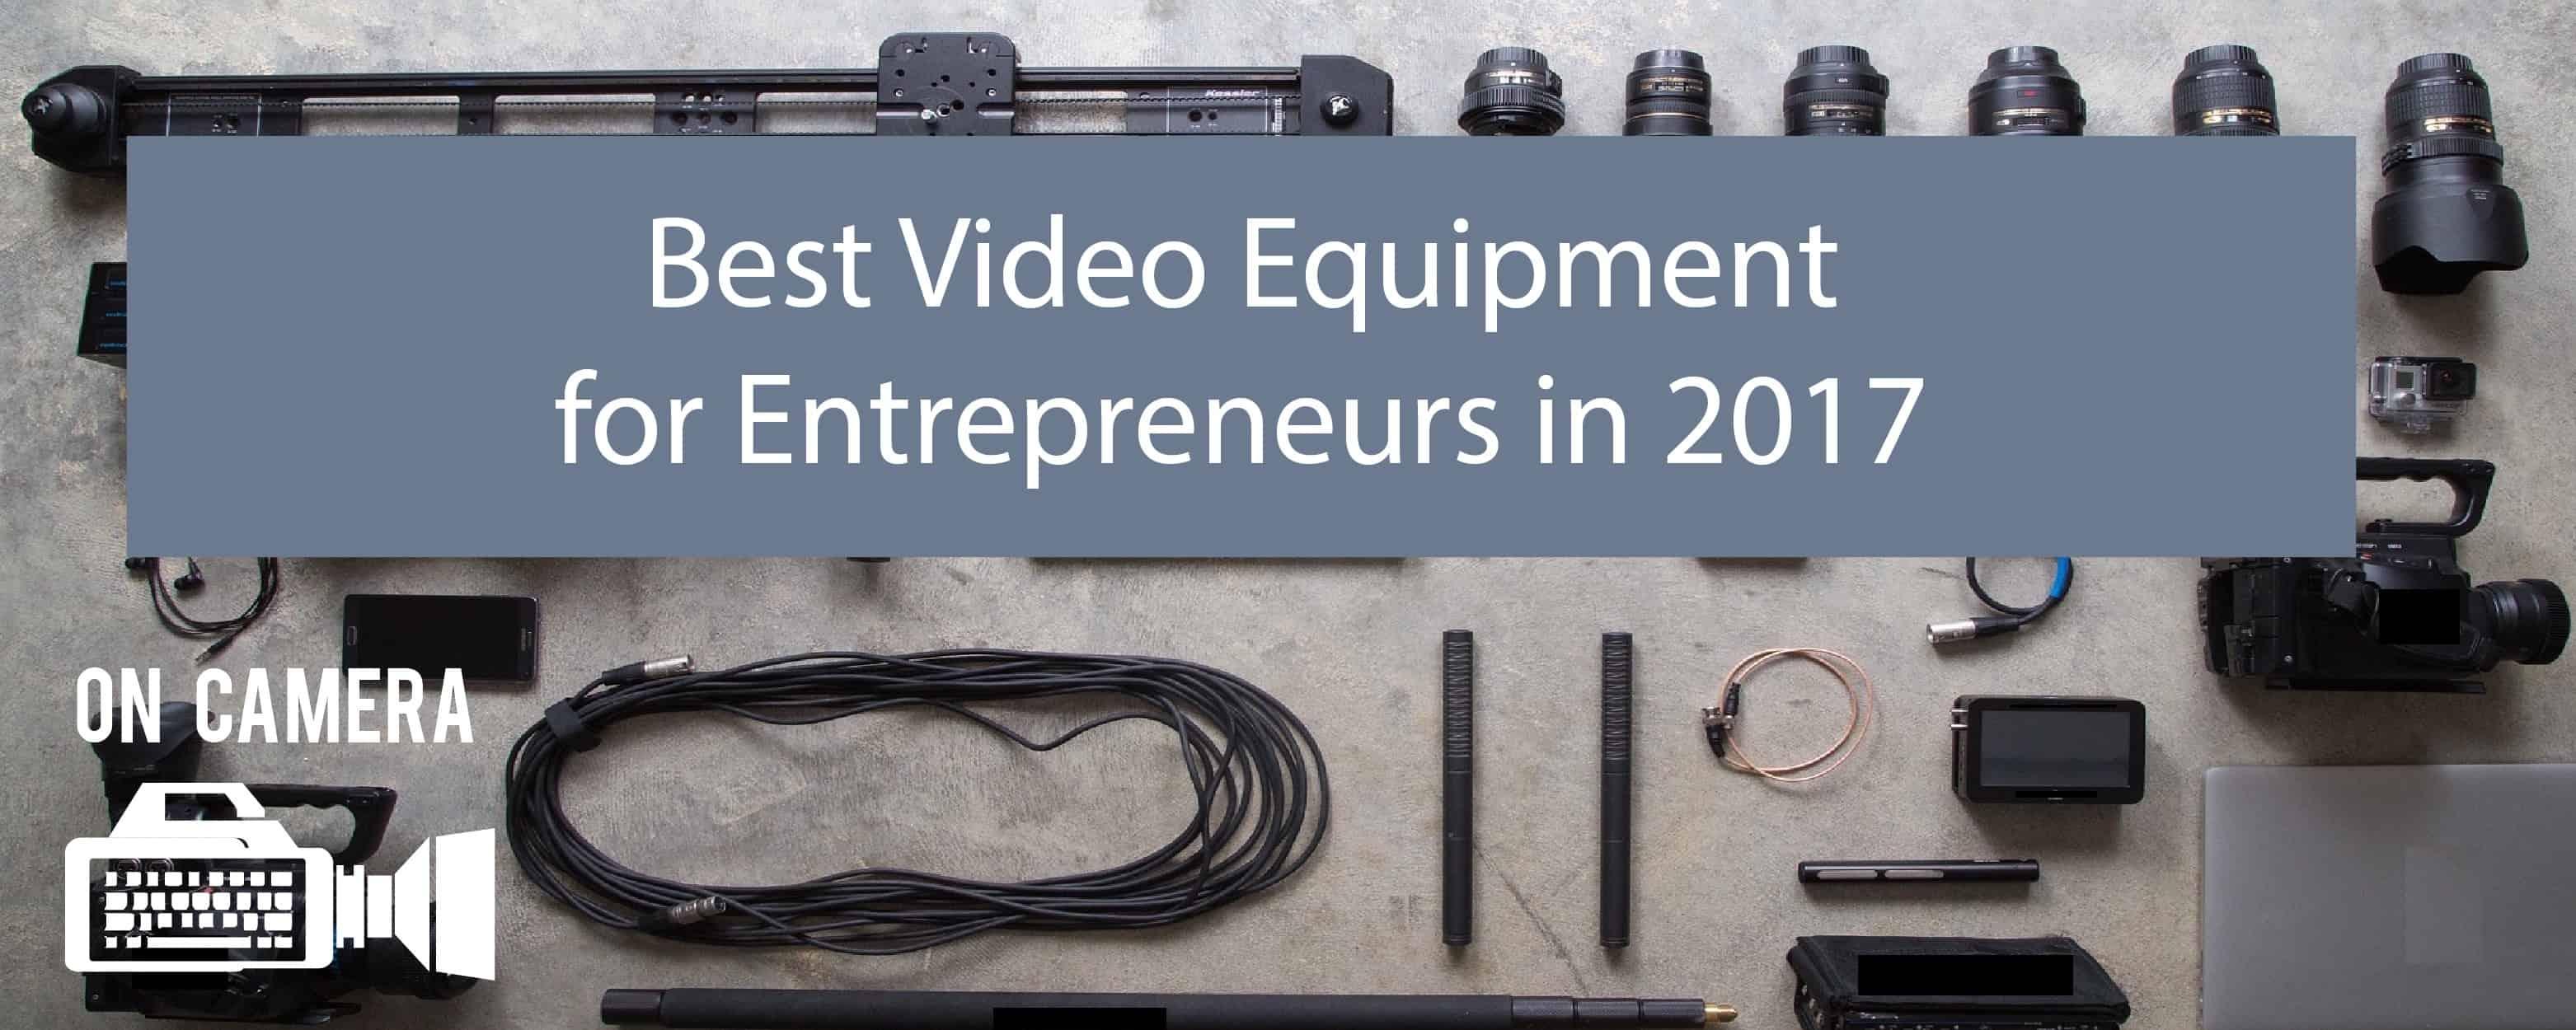 Best Video Equipment for Entrepreneurs in 2017 | Keynote Content